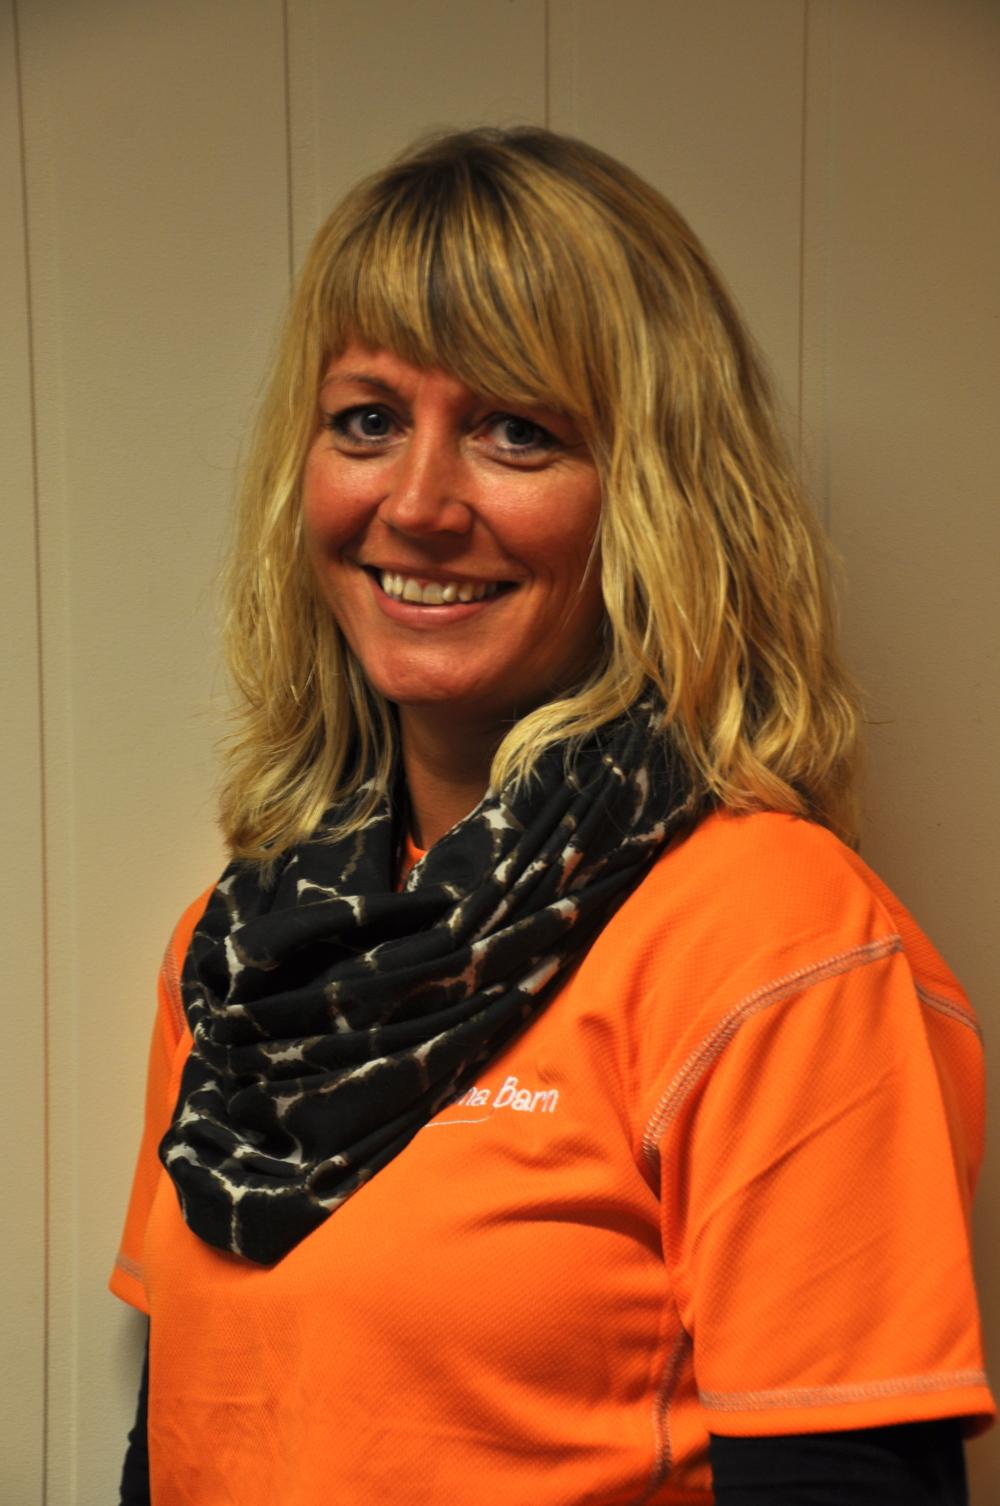 Hanne Elisabeth